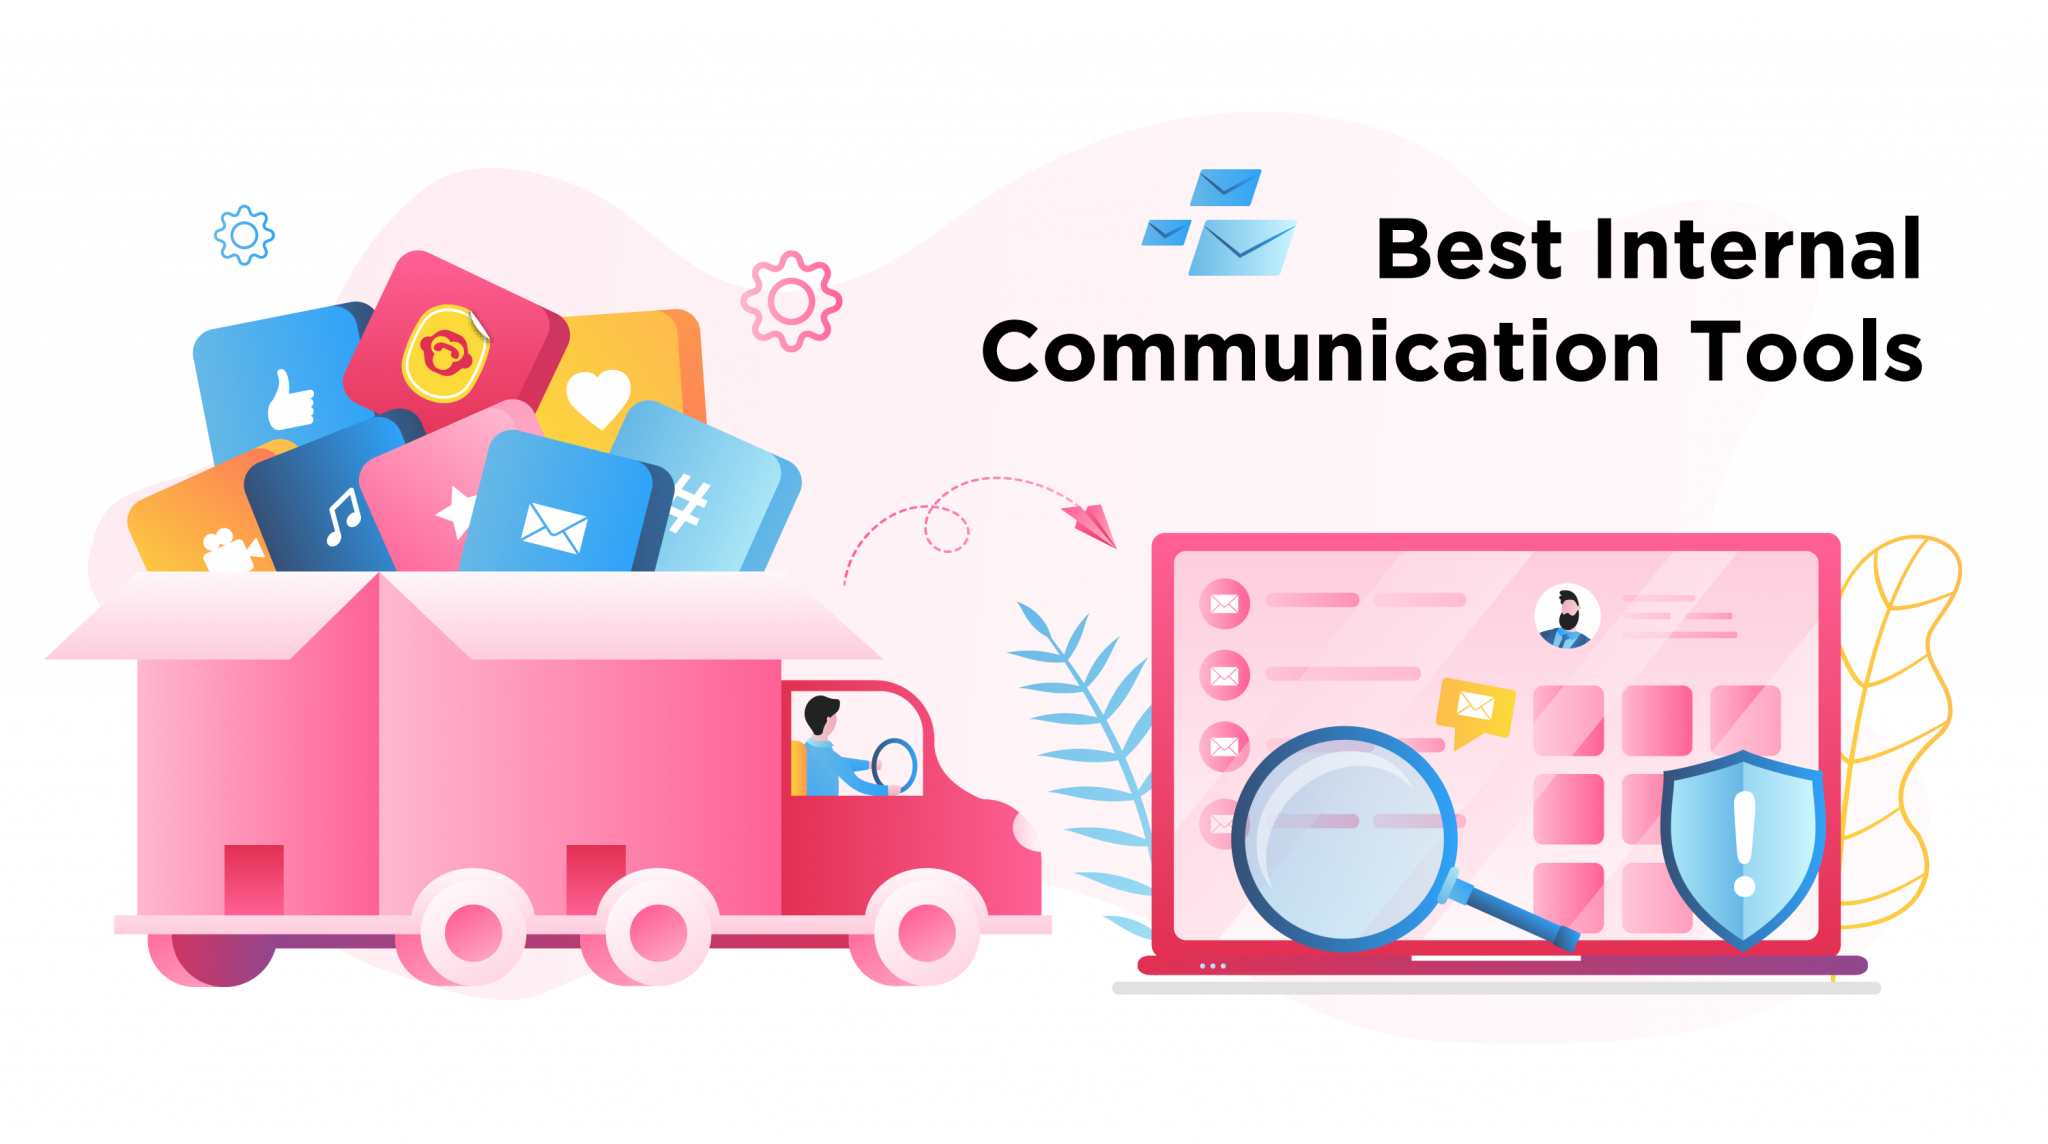 best internal communicaton tools header image